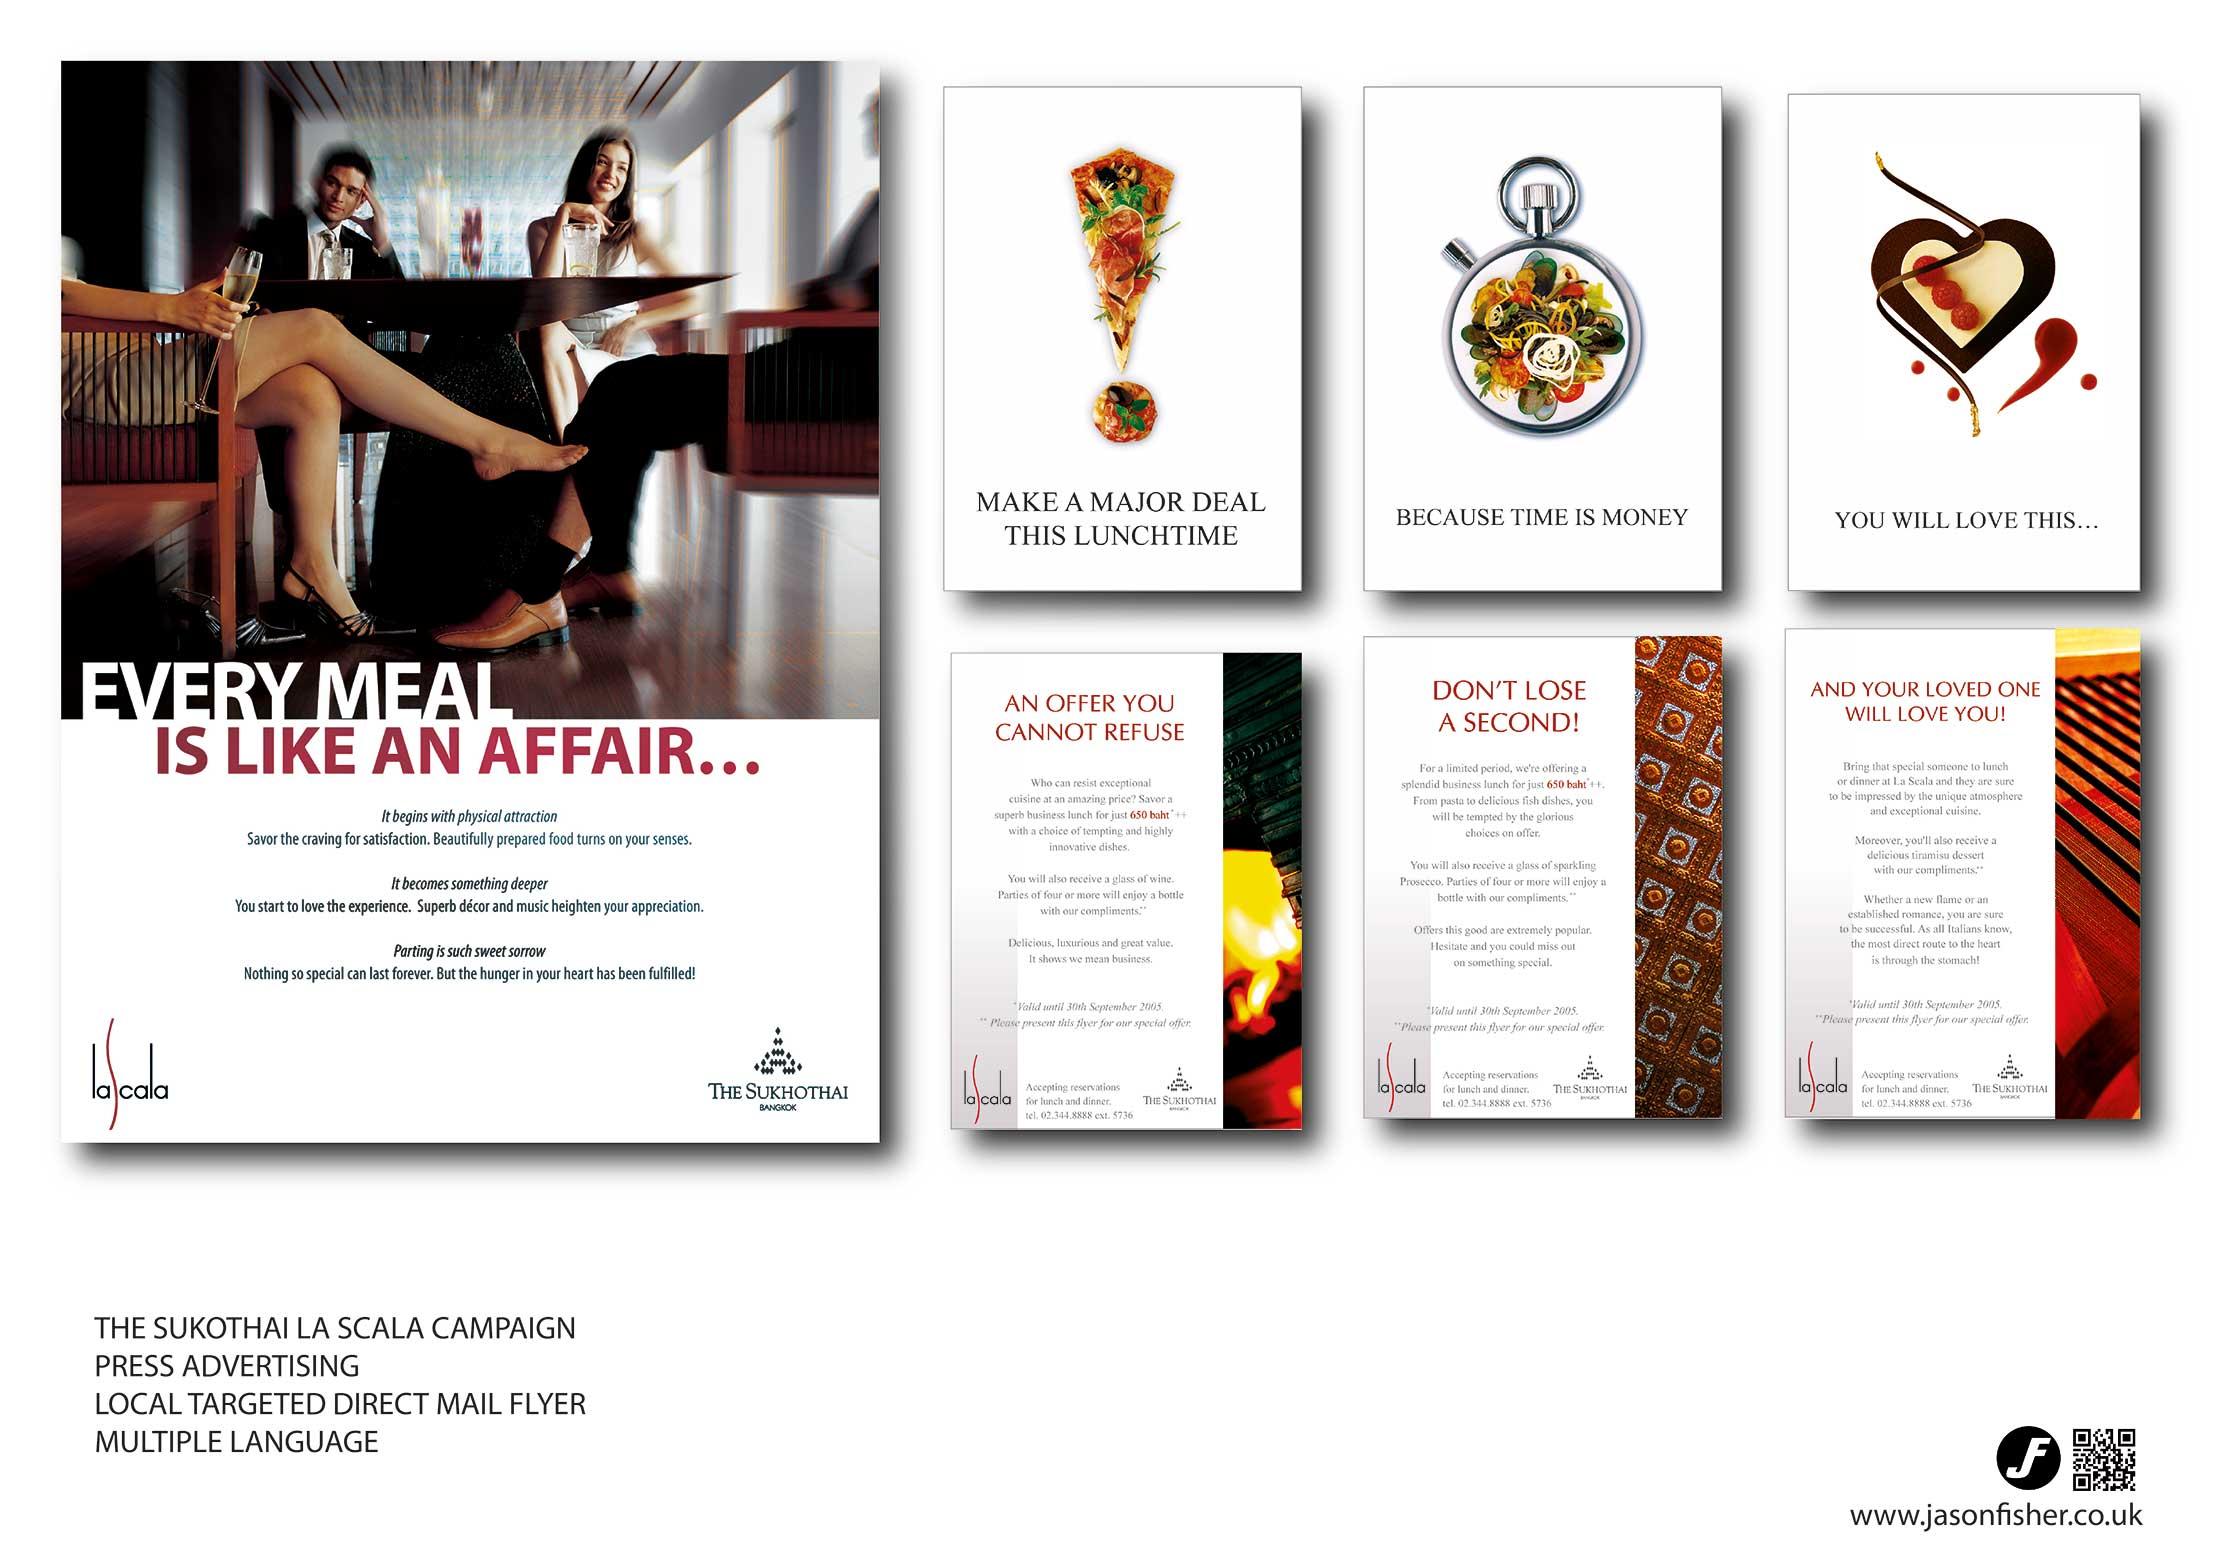 Hotel Sukothai advertising and promotion